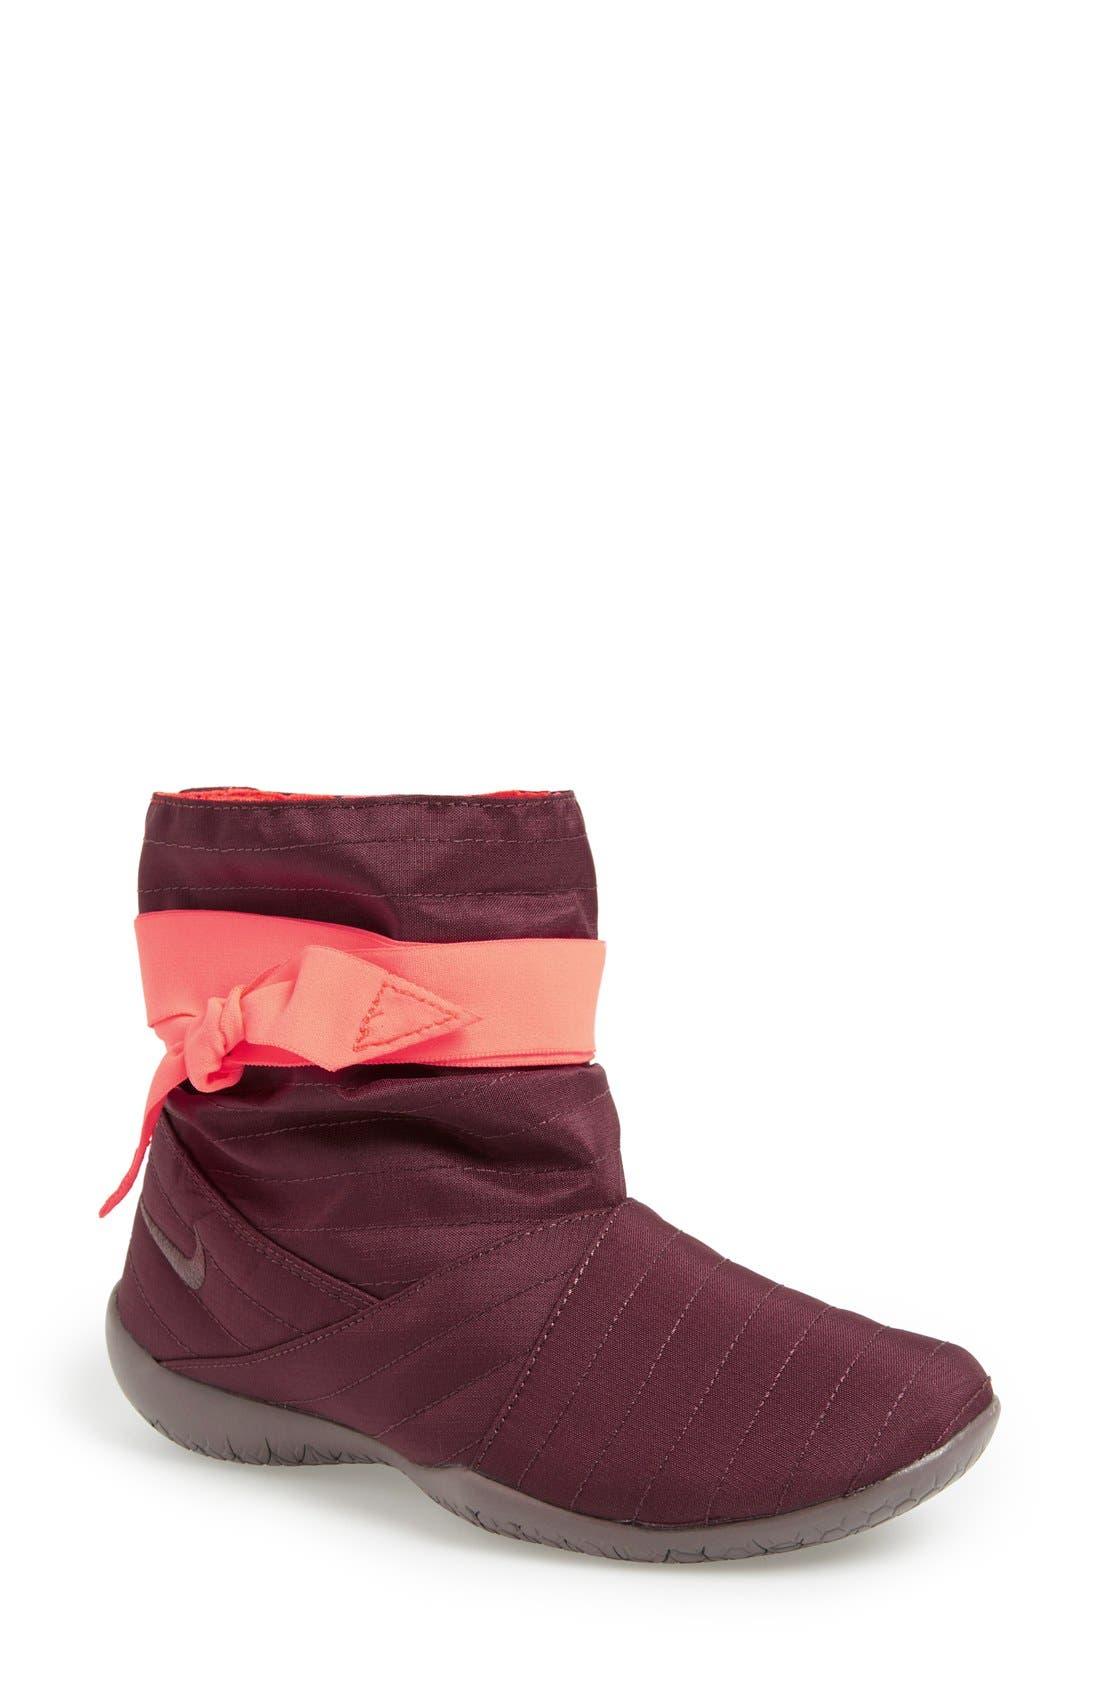 NIKE 'Studio Mid Pack' Yoga Training Shoe, Main, color, 930